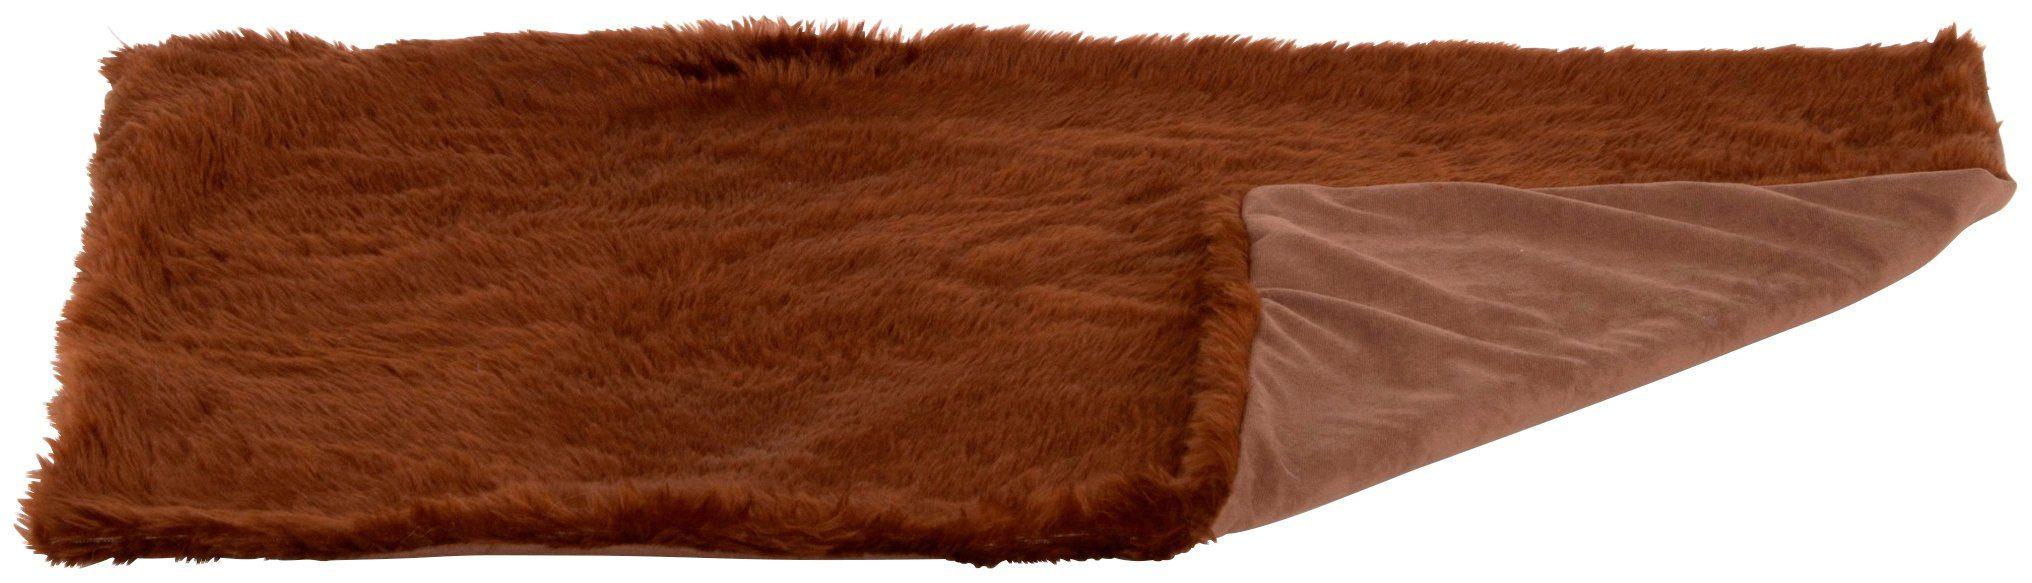 SILVIO DESIGN Hunde-Decke »Ruby Gr. 1«, BxL: 84x54 cm, braun